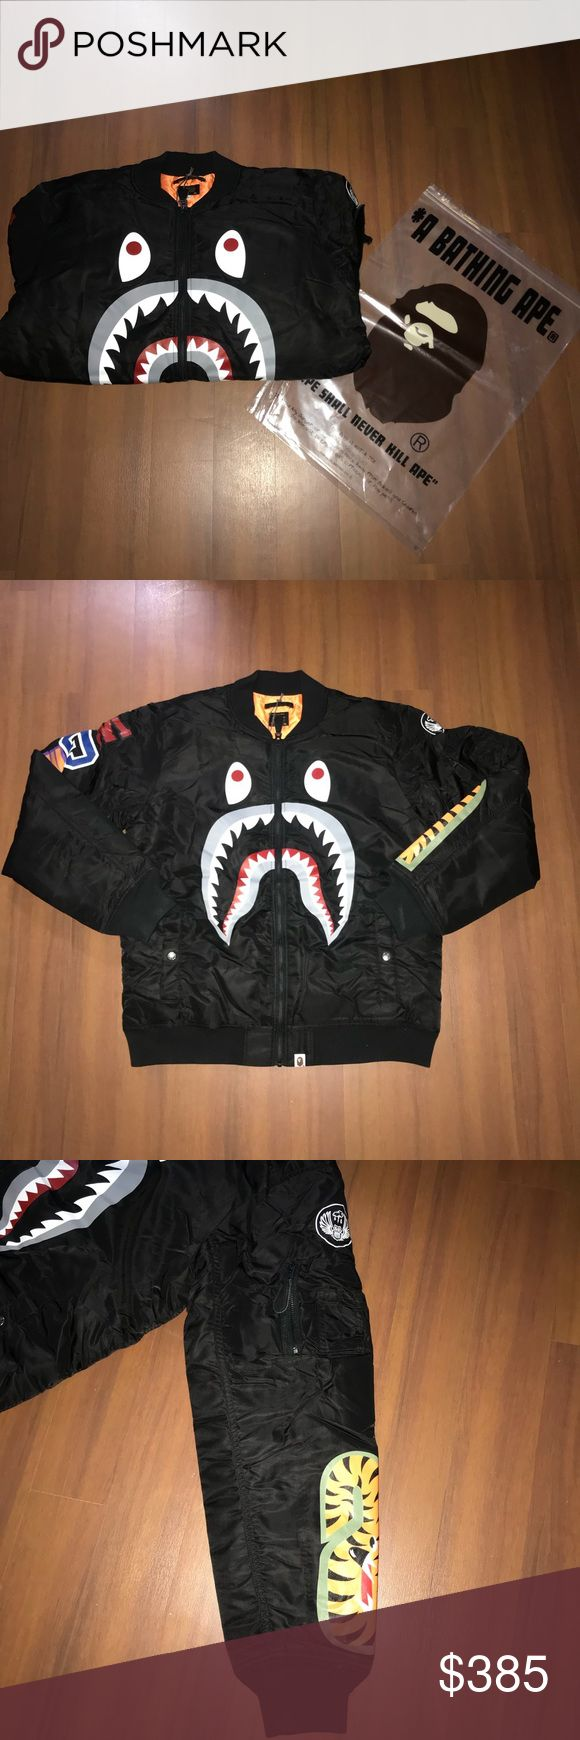 BAPE BLACK SHARK BOMBER FLIGHT JACKET No trade. For sale